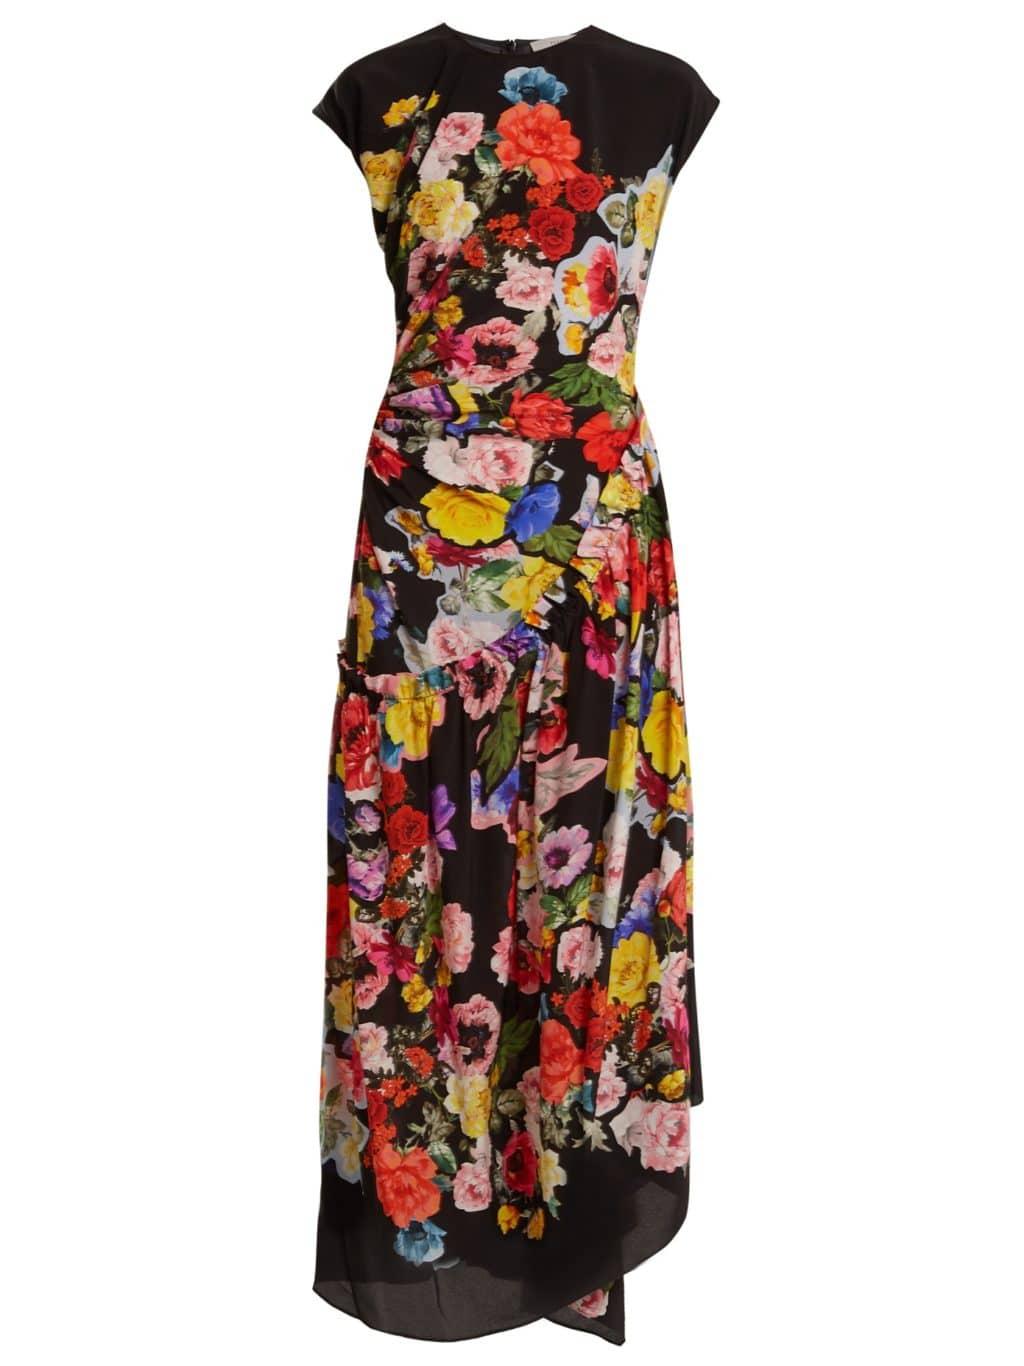 PREEN BY THORNTON BREGAZZI Lavender Round-neck Silk Black / Floralprinted Dress